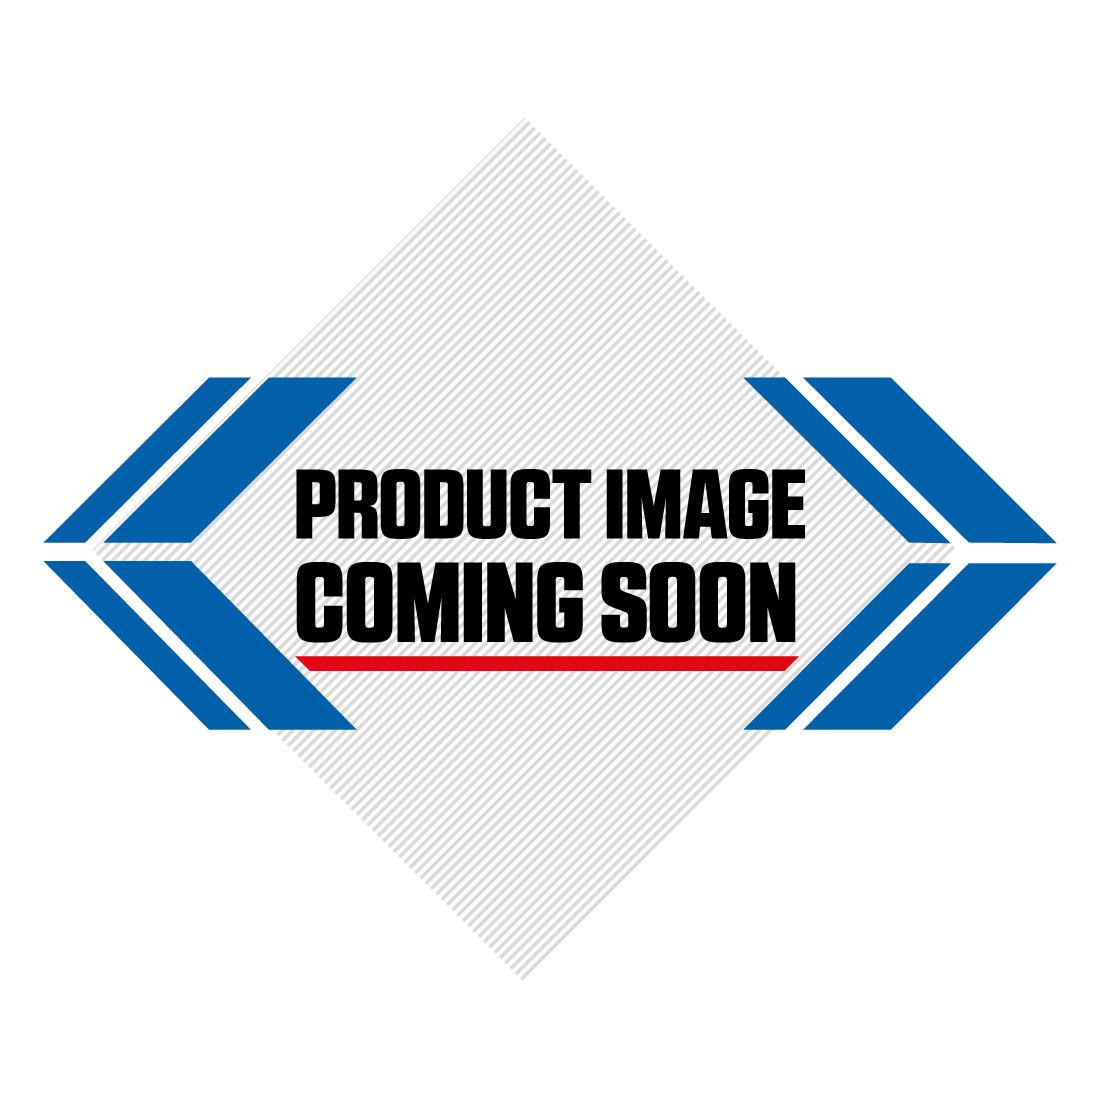 Suzuki Plastic Kit RMZ 450 (08-17) OEM Factory Image-1